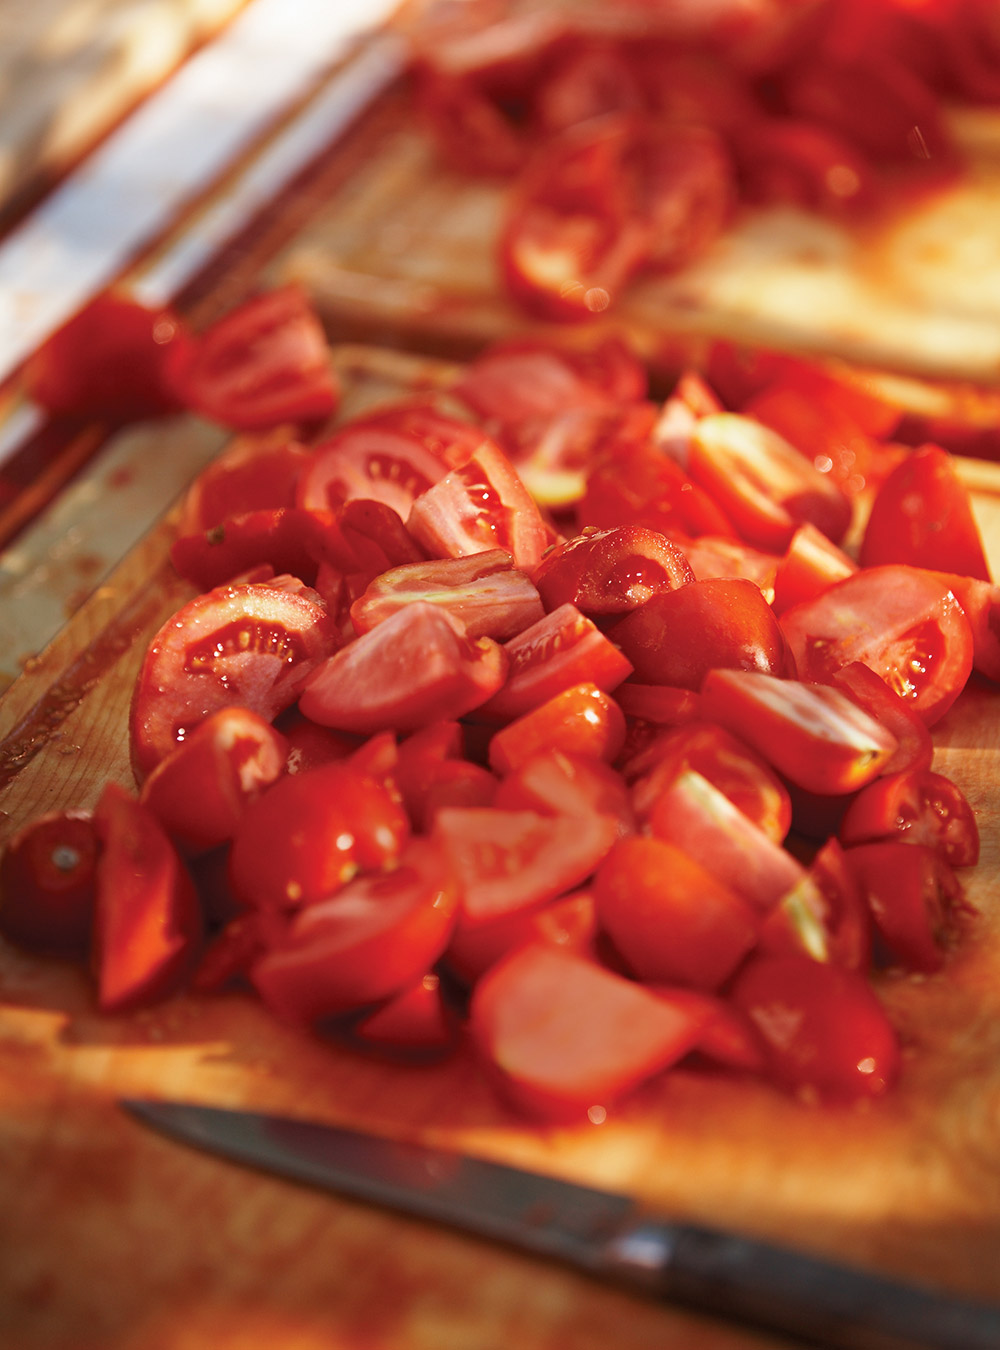 Sauce tomate avec tomates fraîches sans machine | ricardo